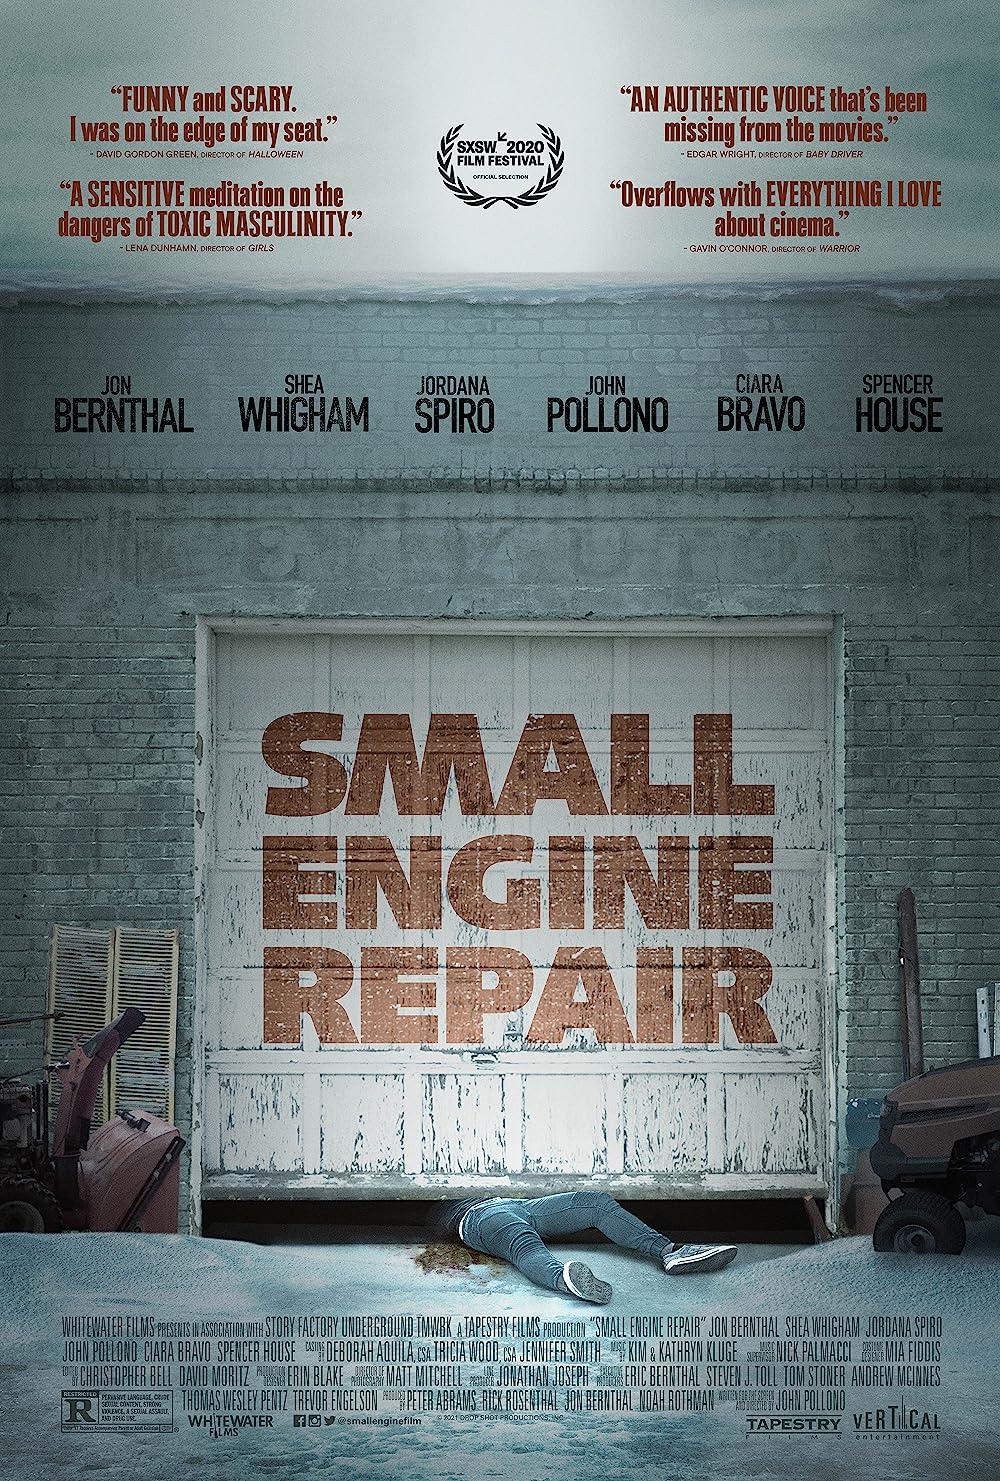 Small Engine Repair (2021) Bengali Dubbed (Voice Over) WEBRip 720p [Full Movie] 1XBET